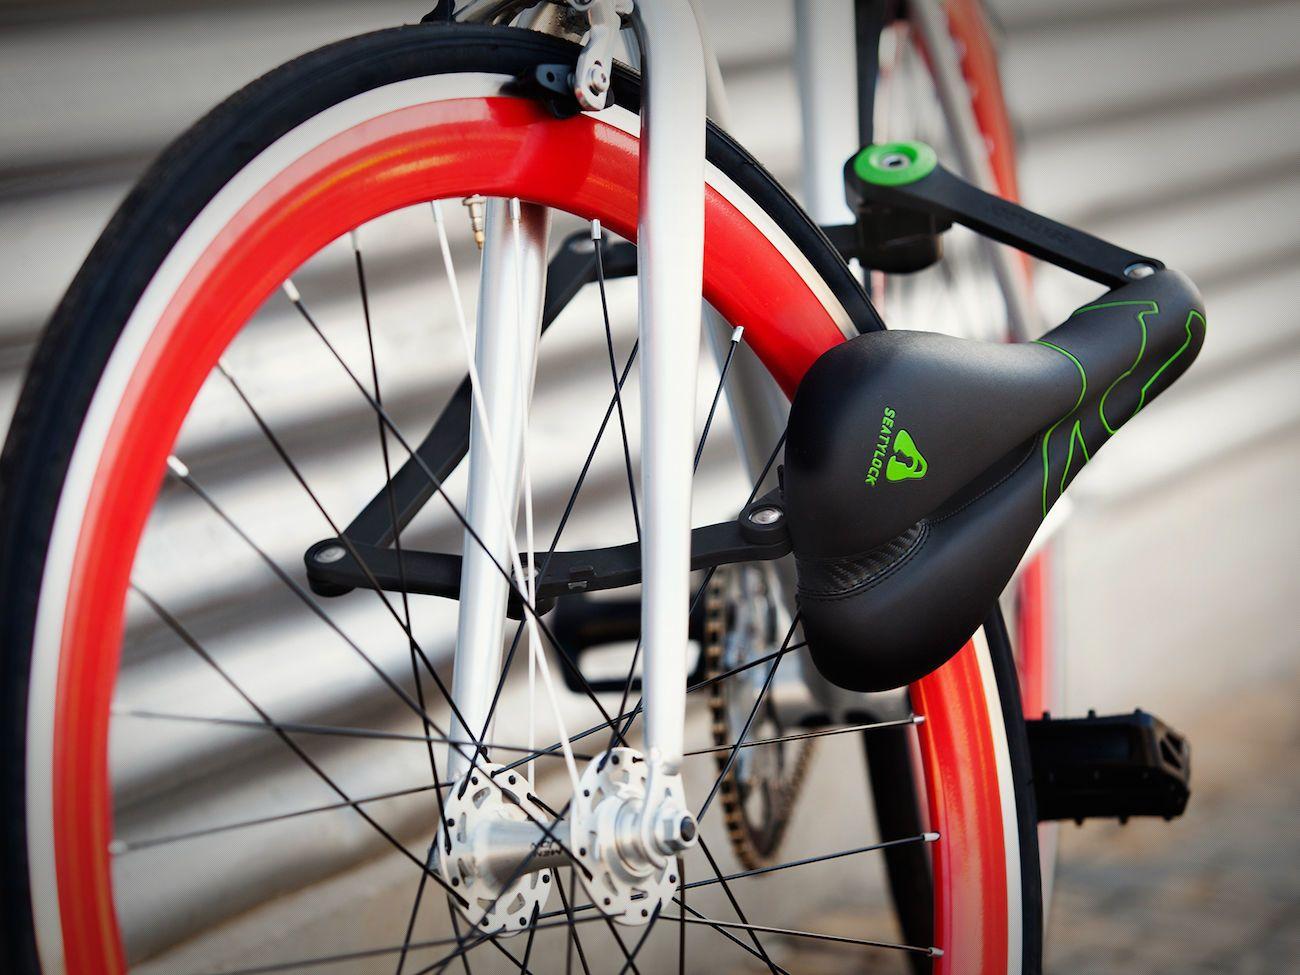 SEATYLOCK Anti-Theft Bicycle Saddle